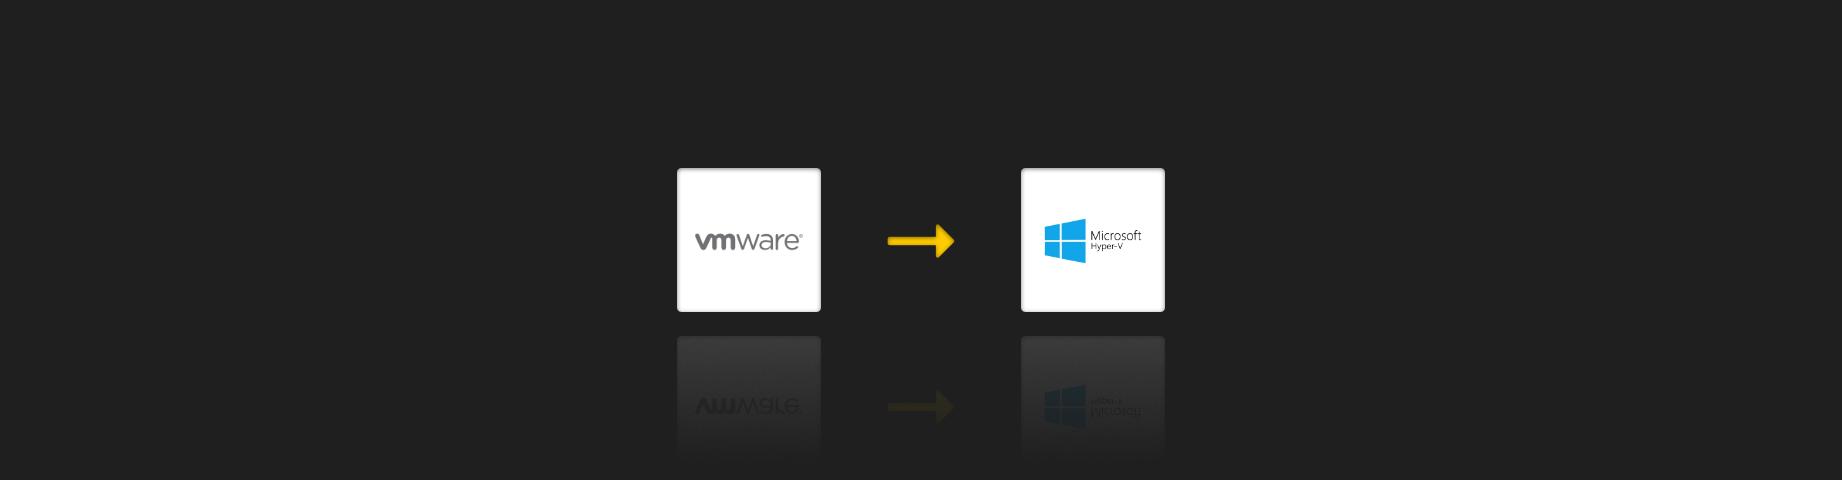 how to convert VMware to Hyper-V